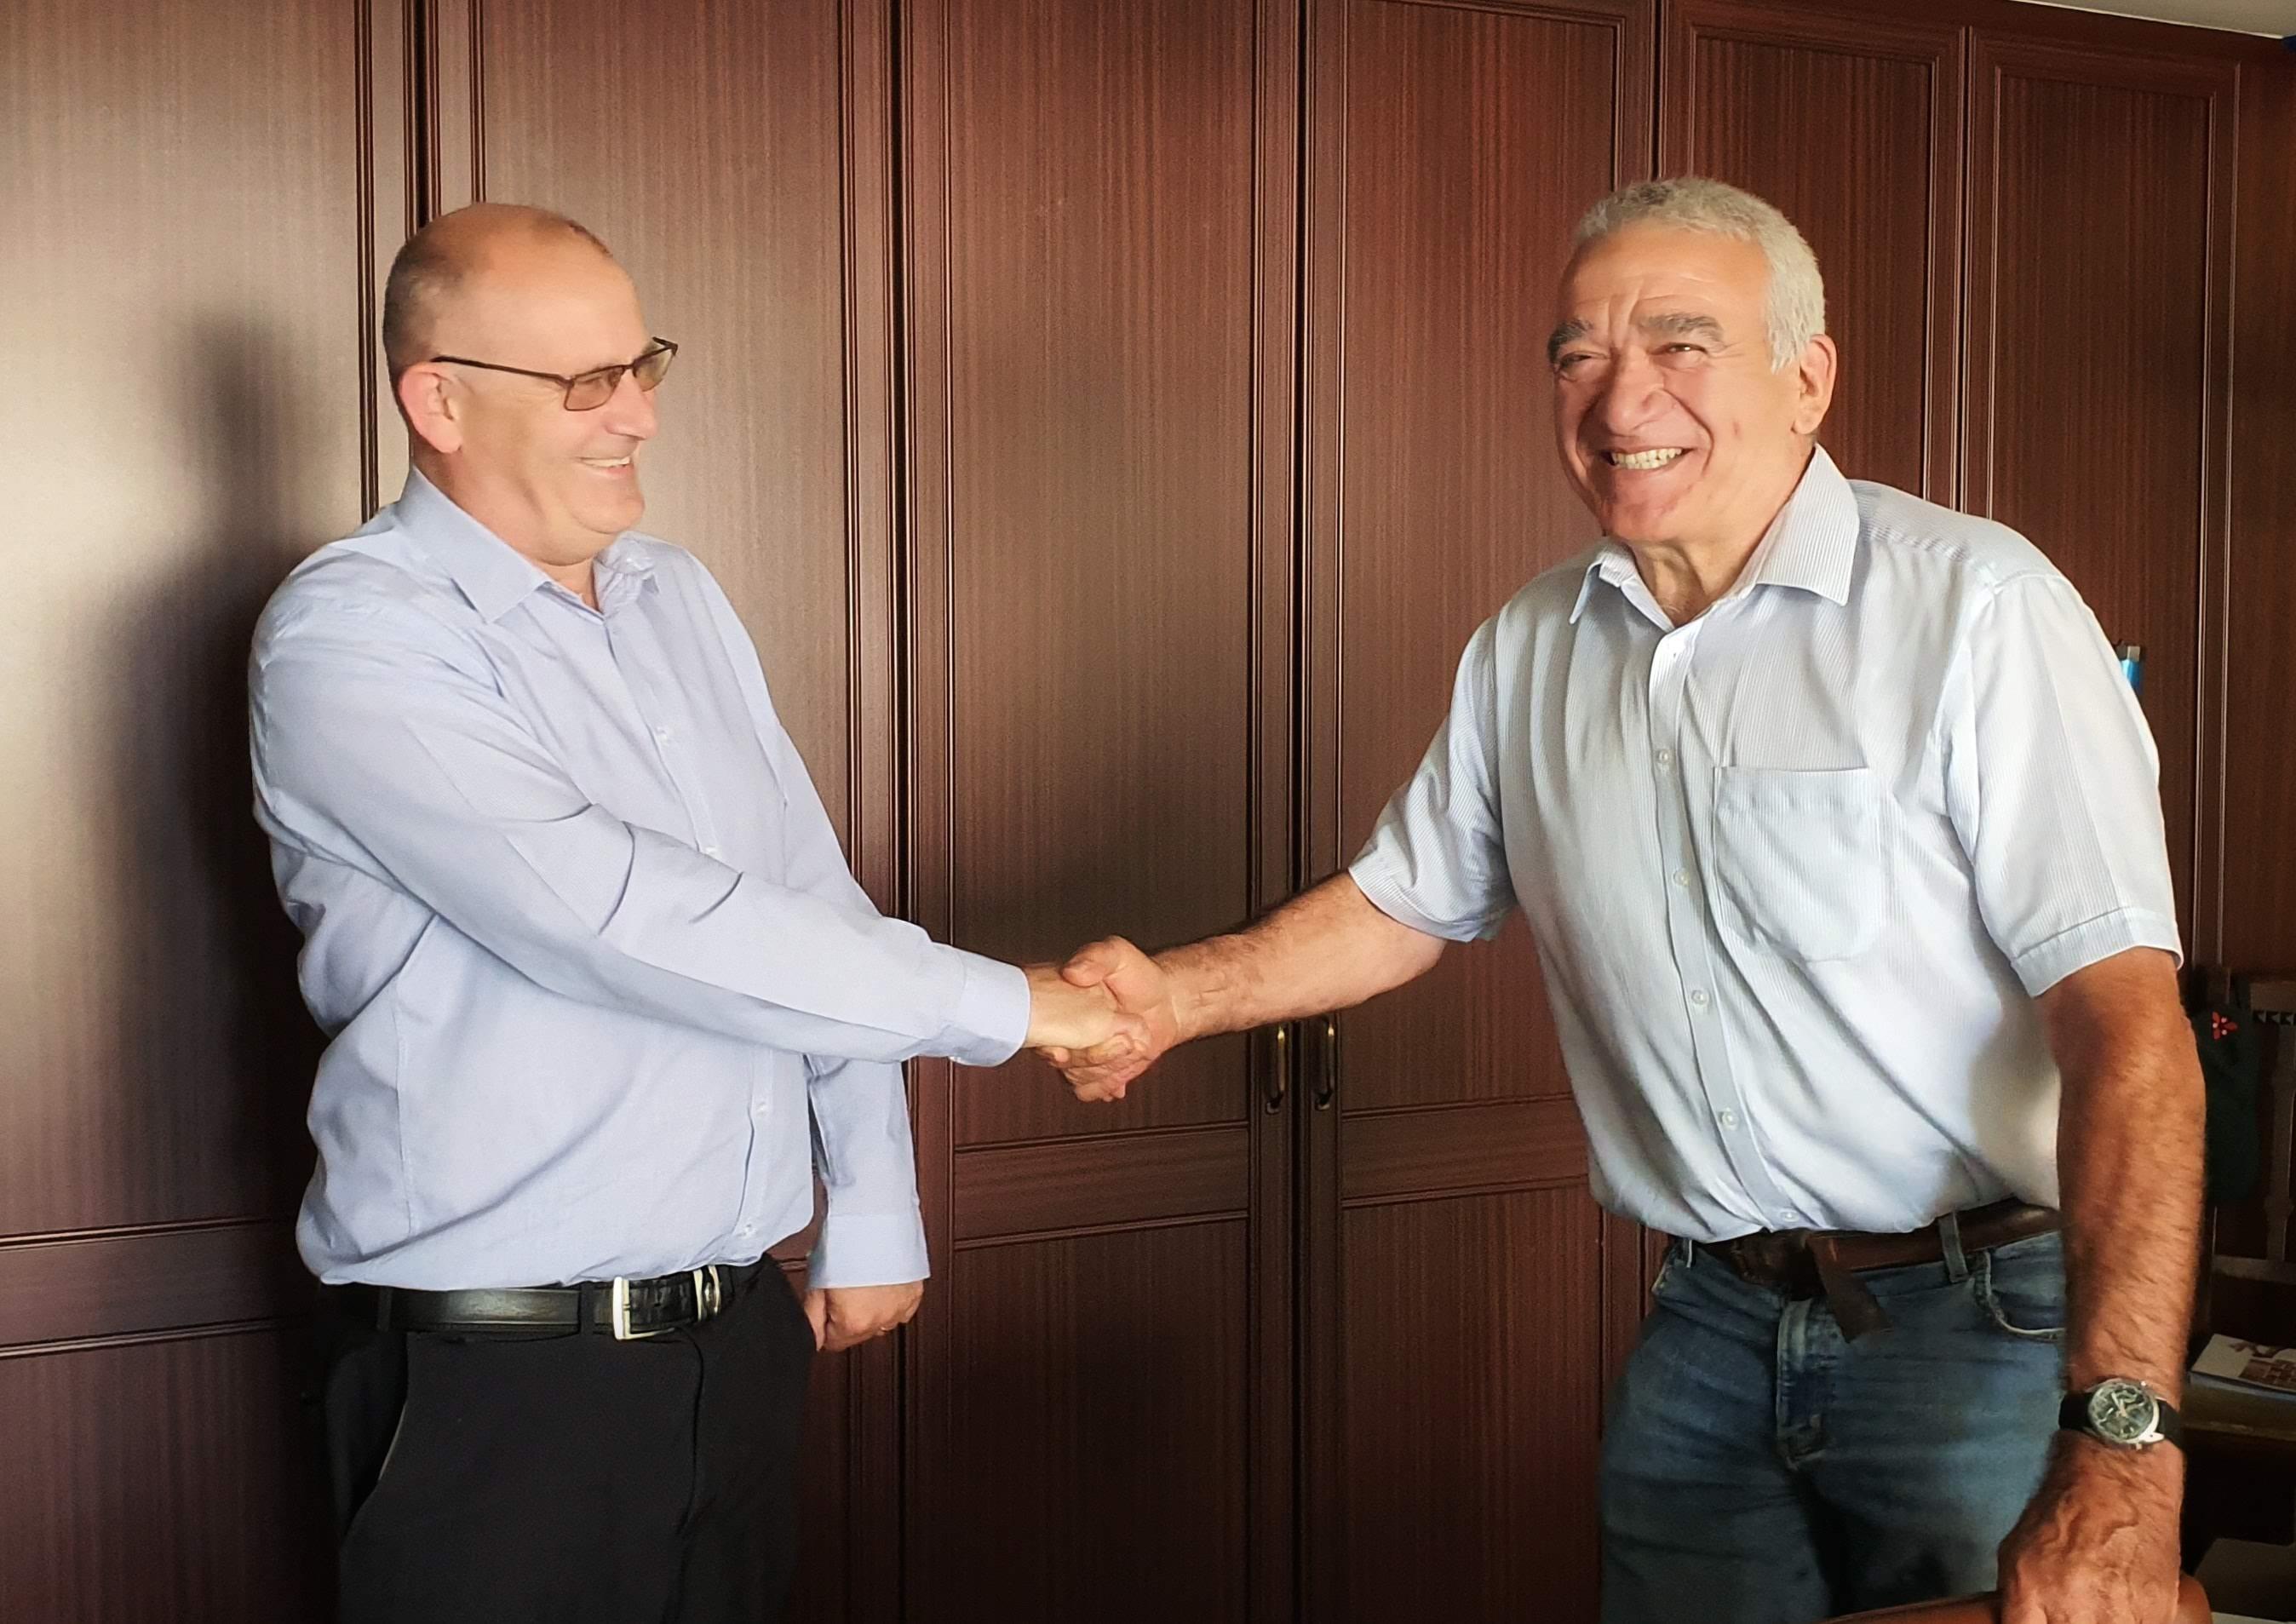 Richard Greetham congratulated by Robert Oldershaw for his long service award